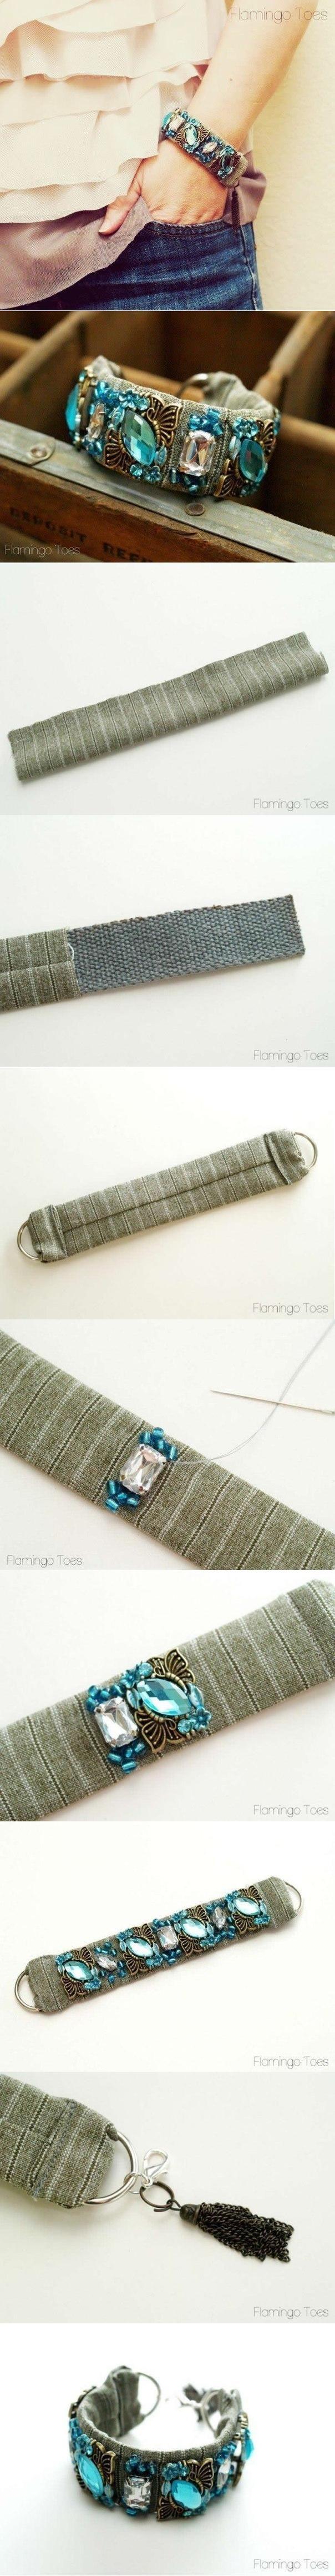 DIY Beautiful Handmade Wristband